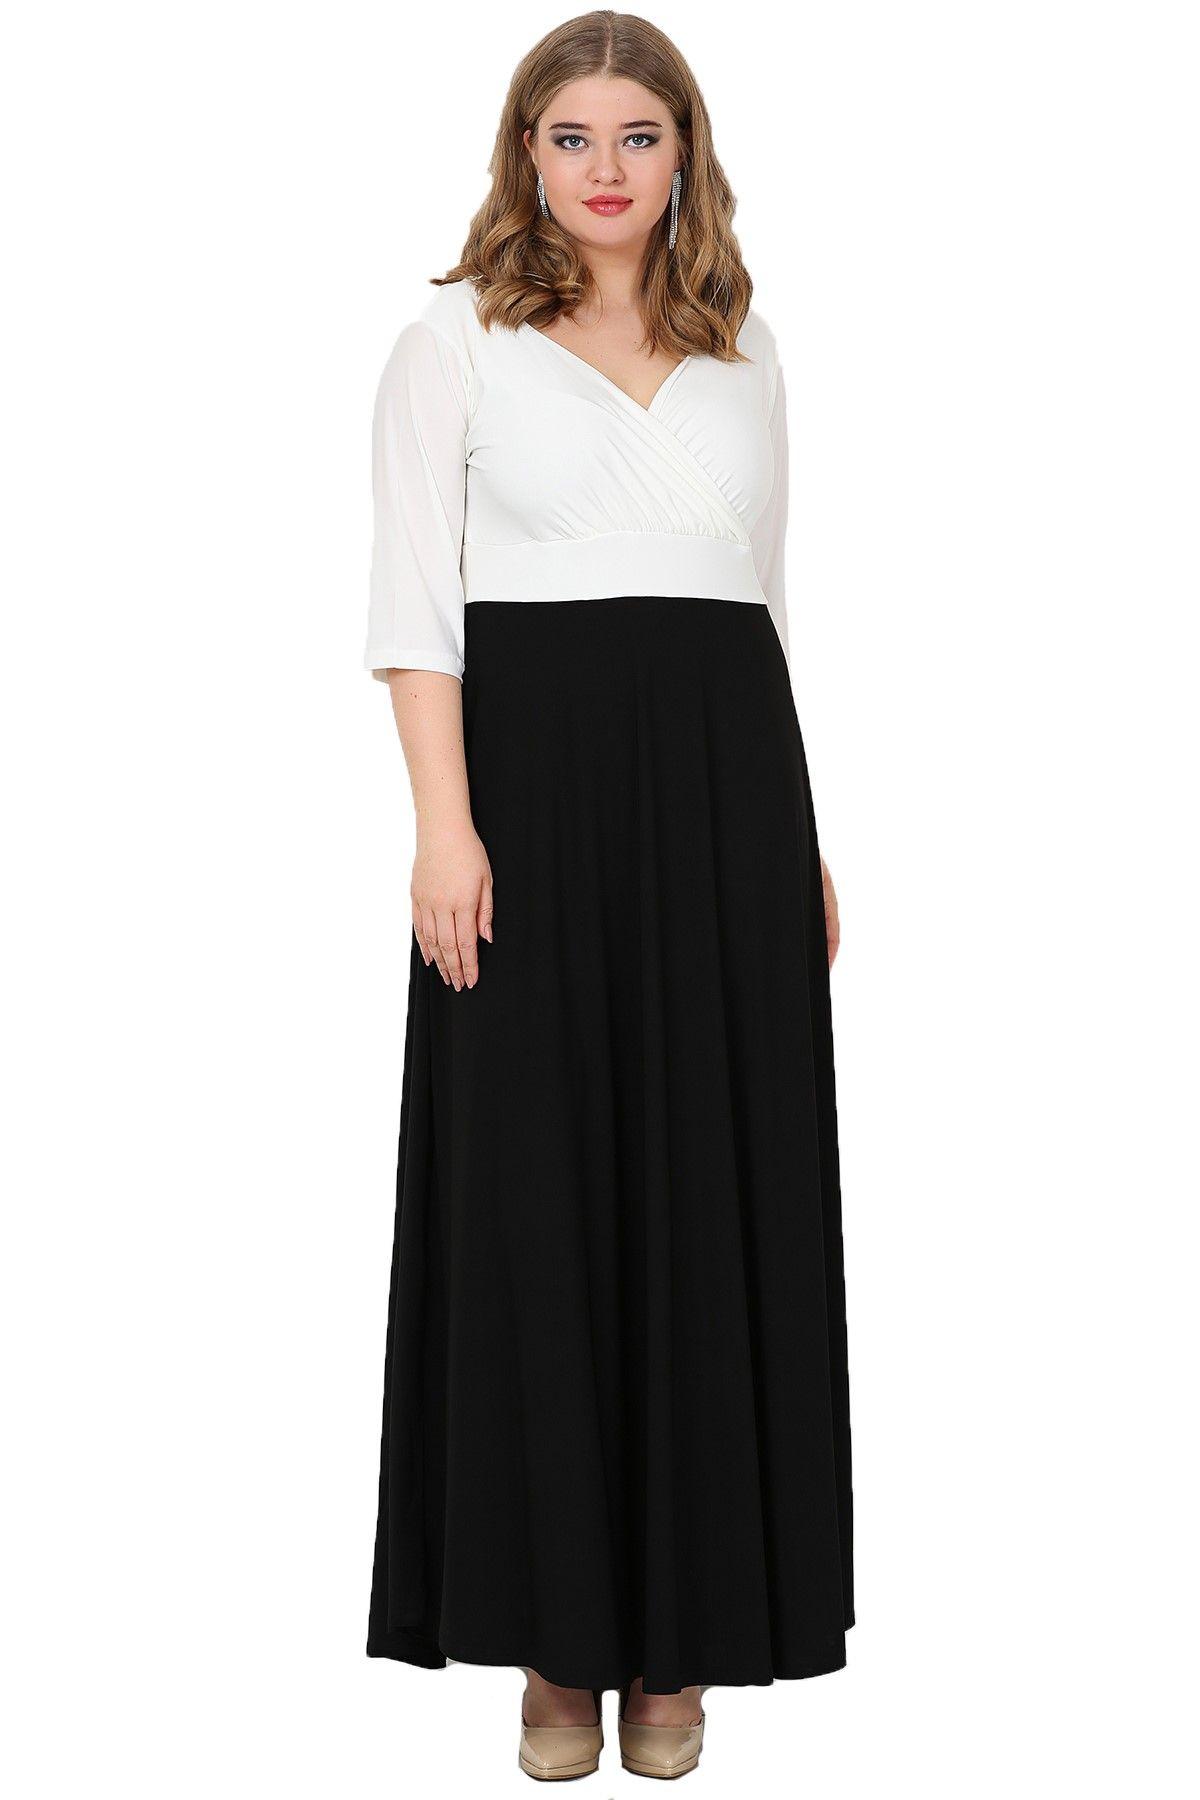 Evening Dress-Black-White